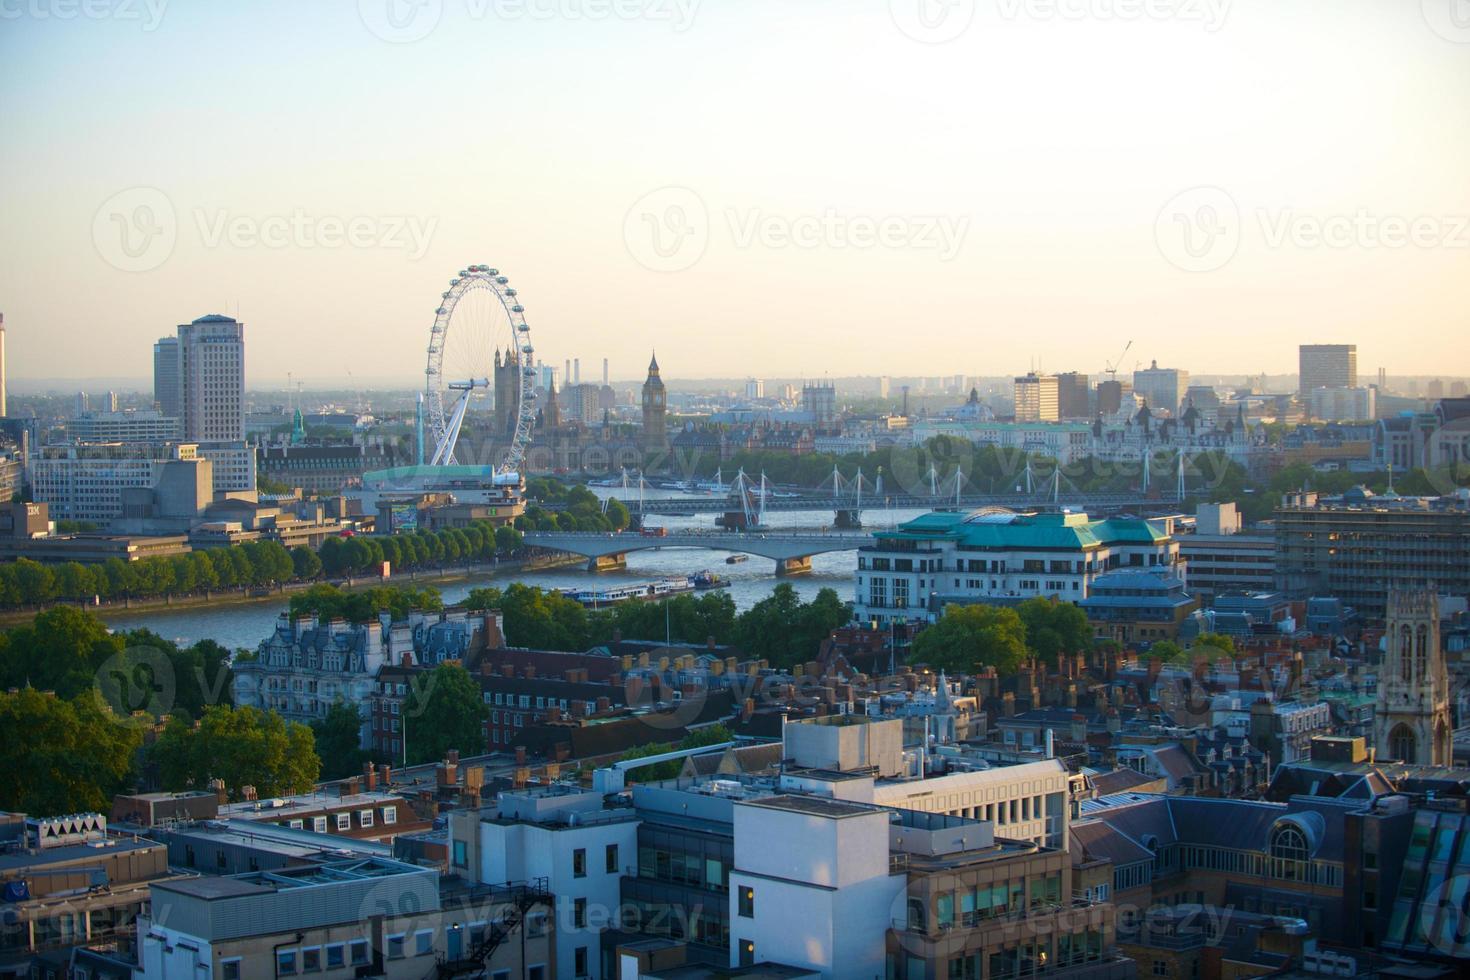 London England City Scape photo